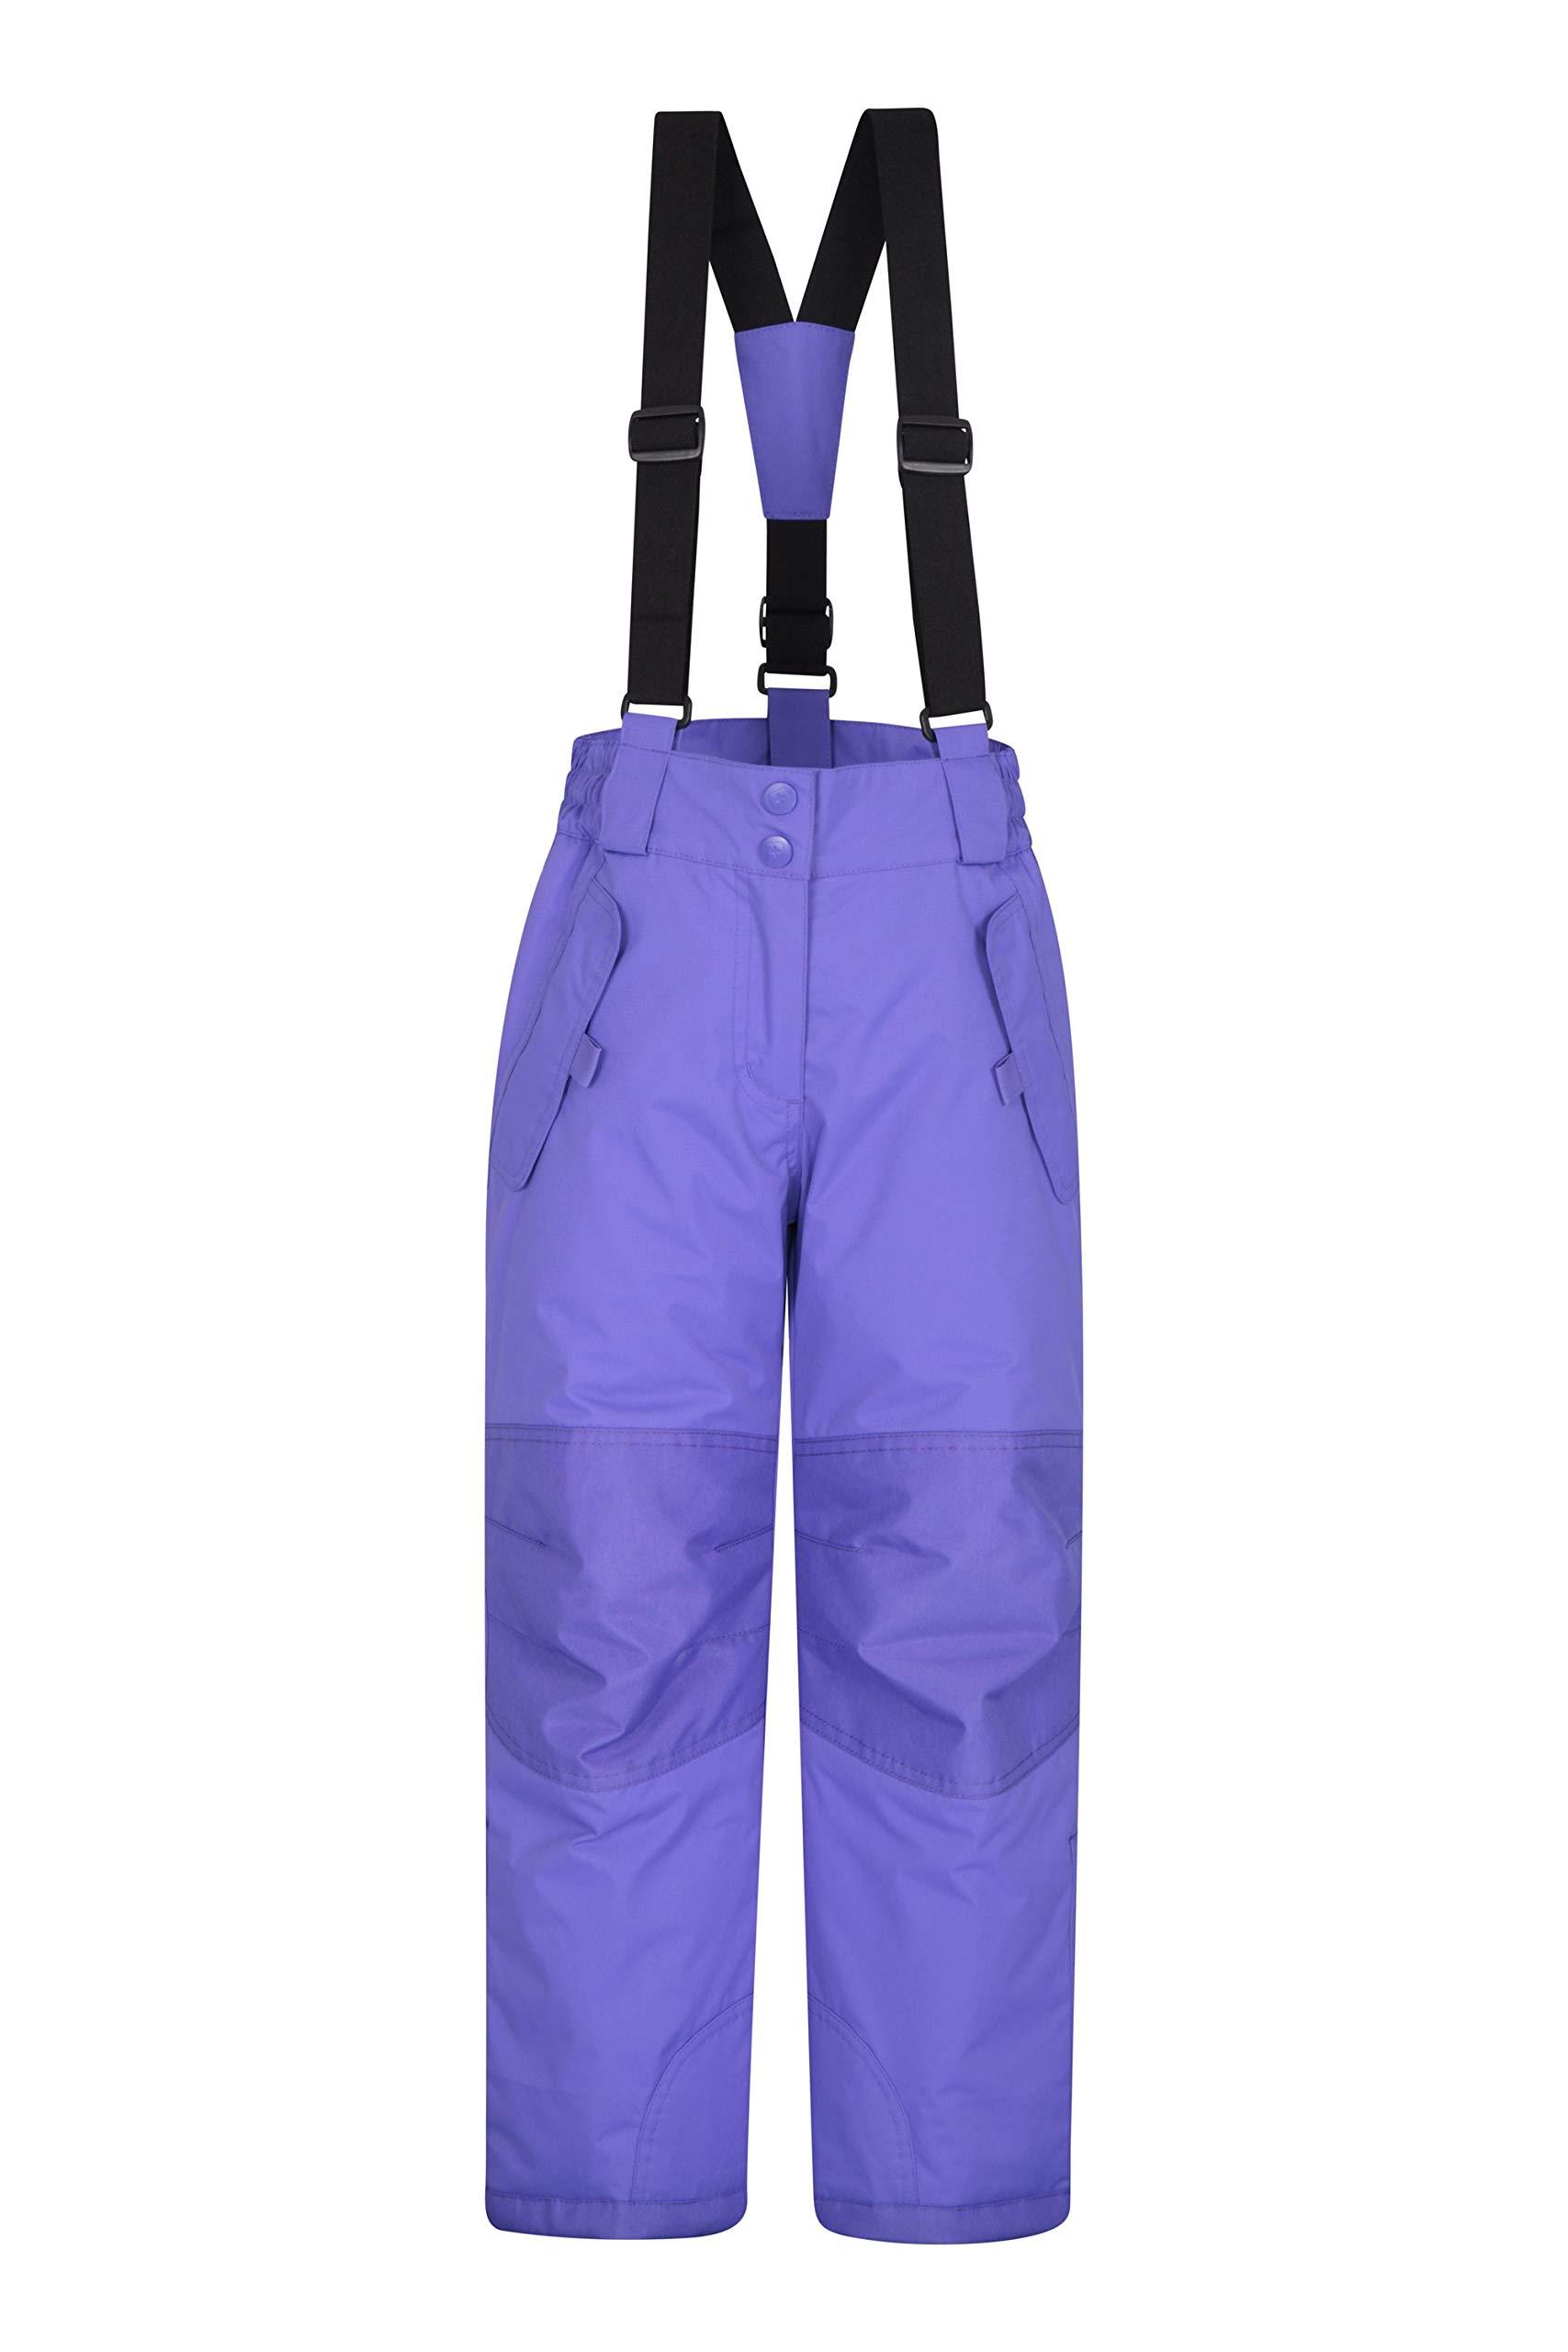 Mountain Warehouse Honey Kids Snow Pants - Ski Bibs, Suspenders Light Purple 5-6 Years by Mountain Warehouse